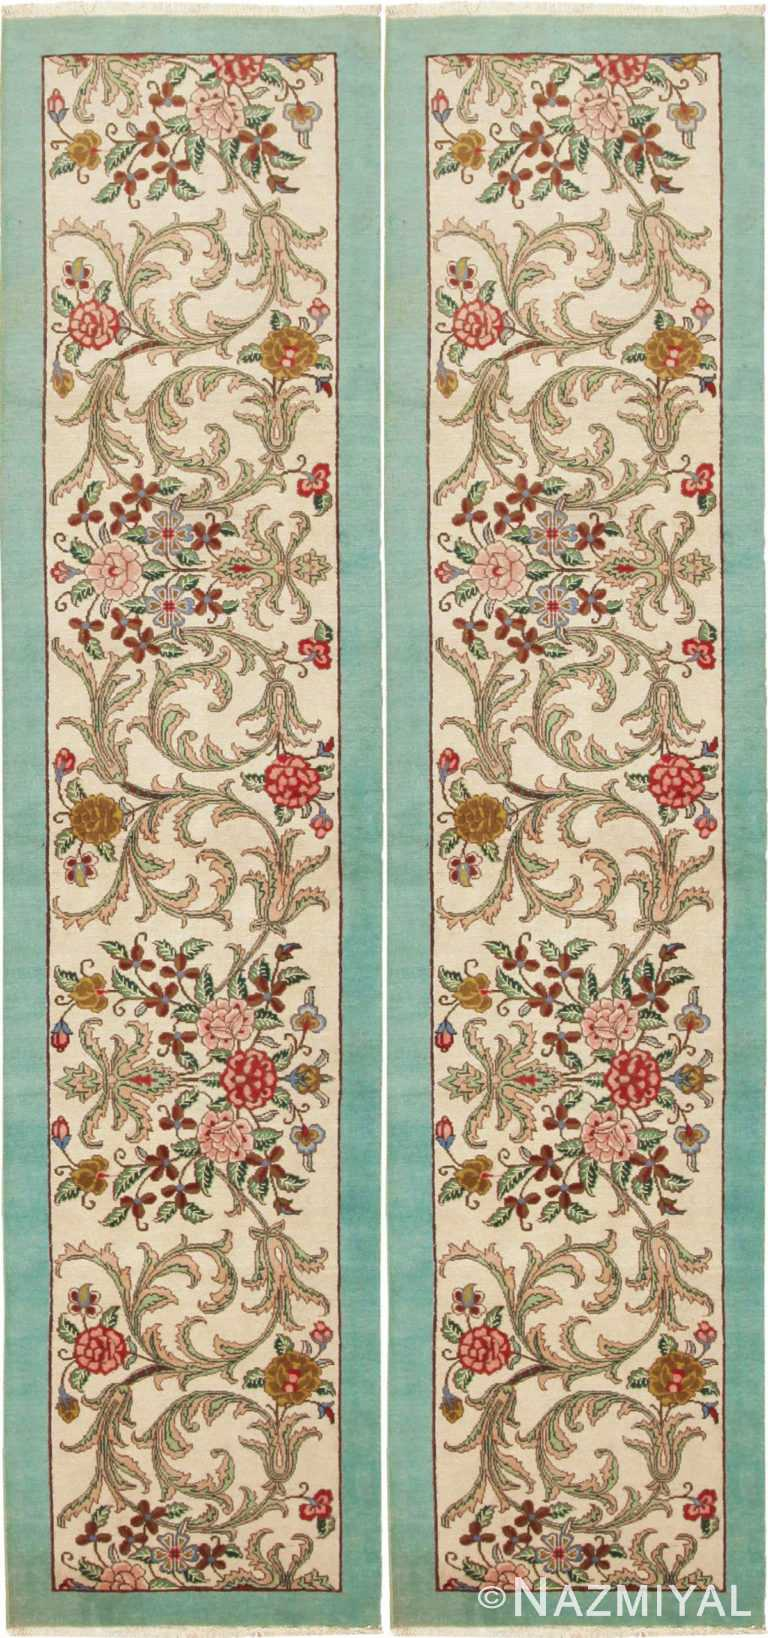 Pair Of Vintage Floral Persian Tabriz Runner Rugs 44738-44739 by Nazmiyal NYC